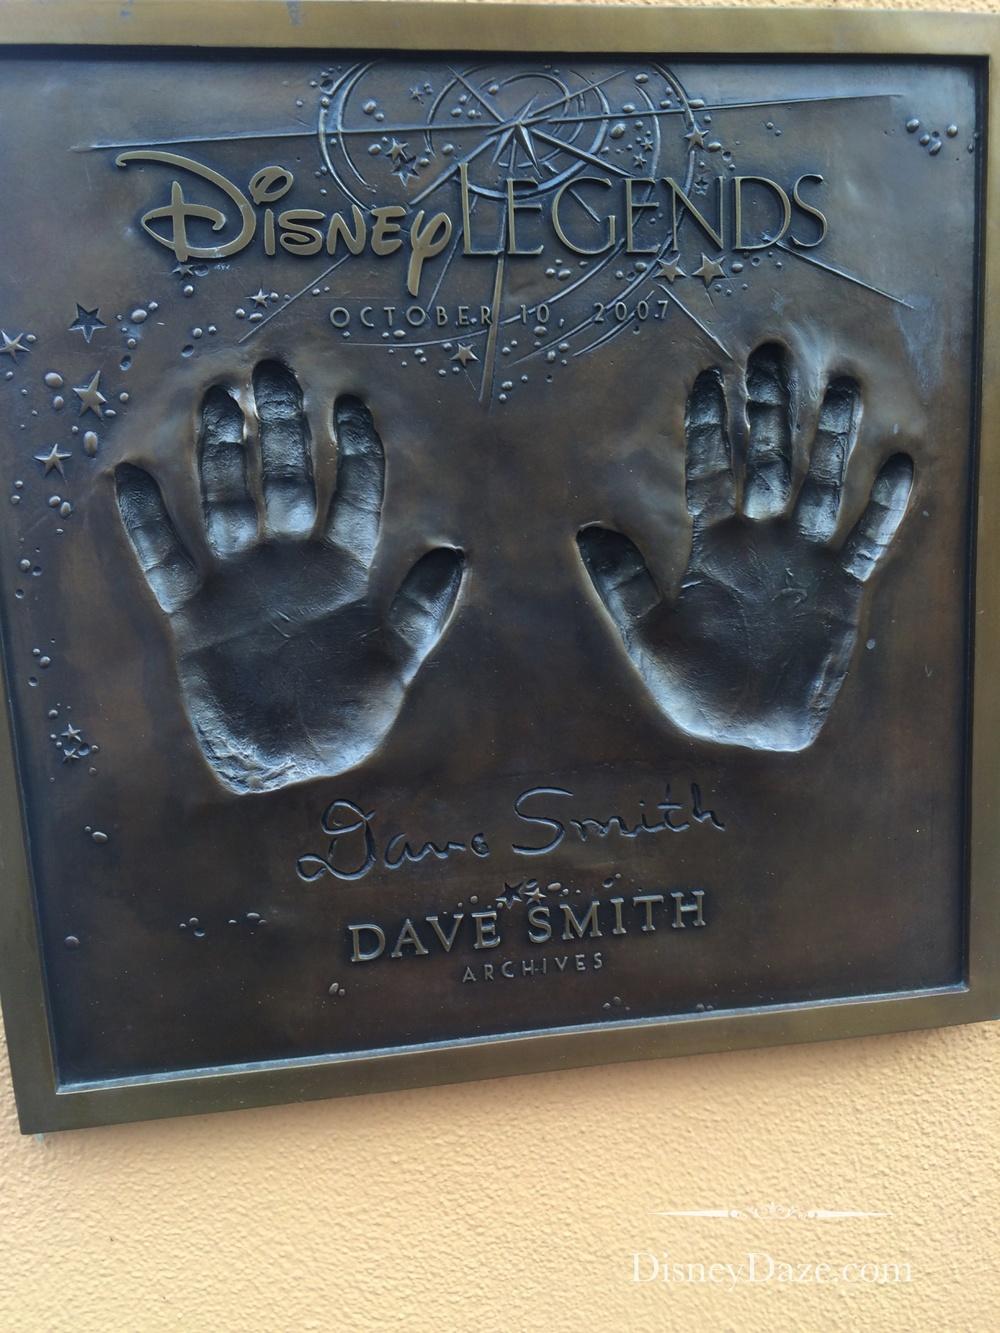 Disney Archivist